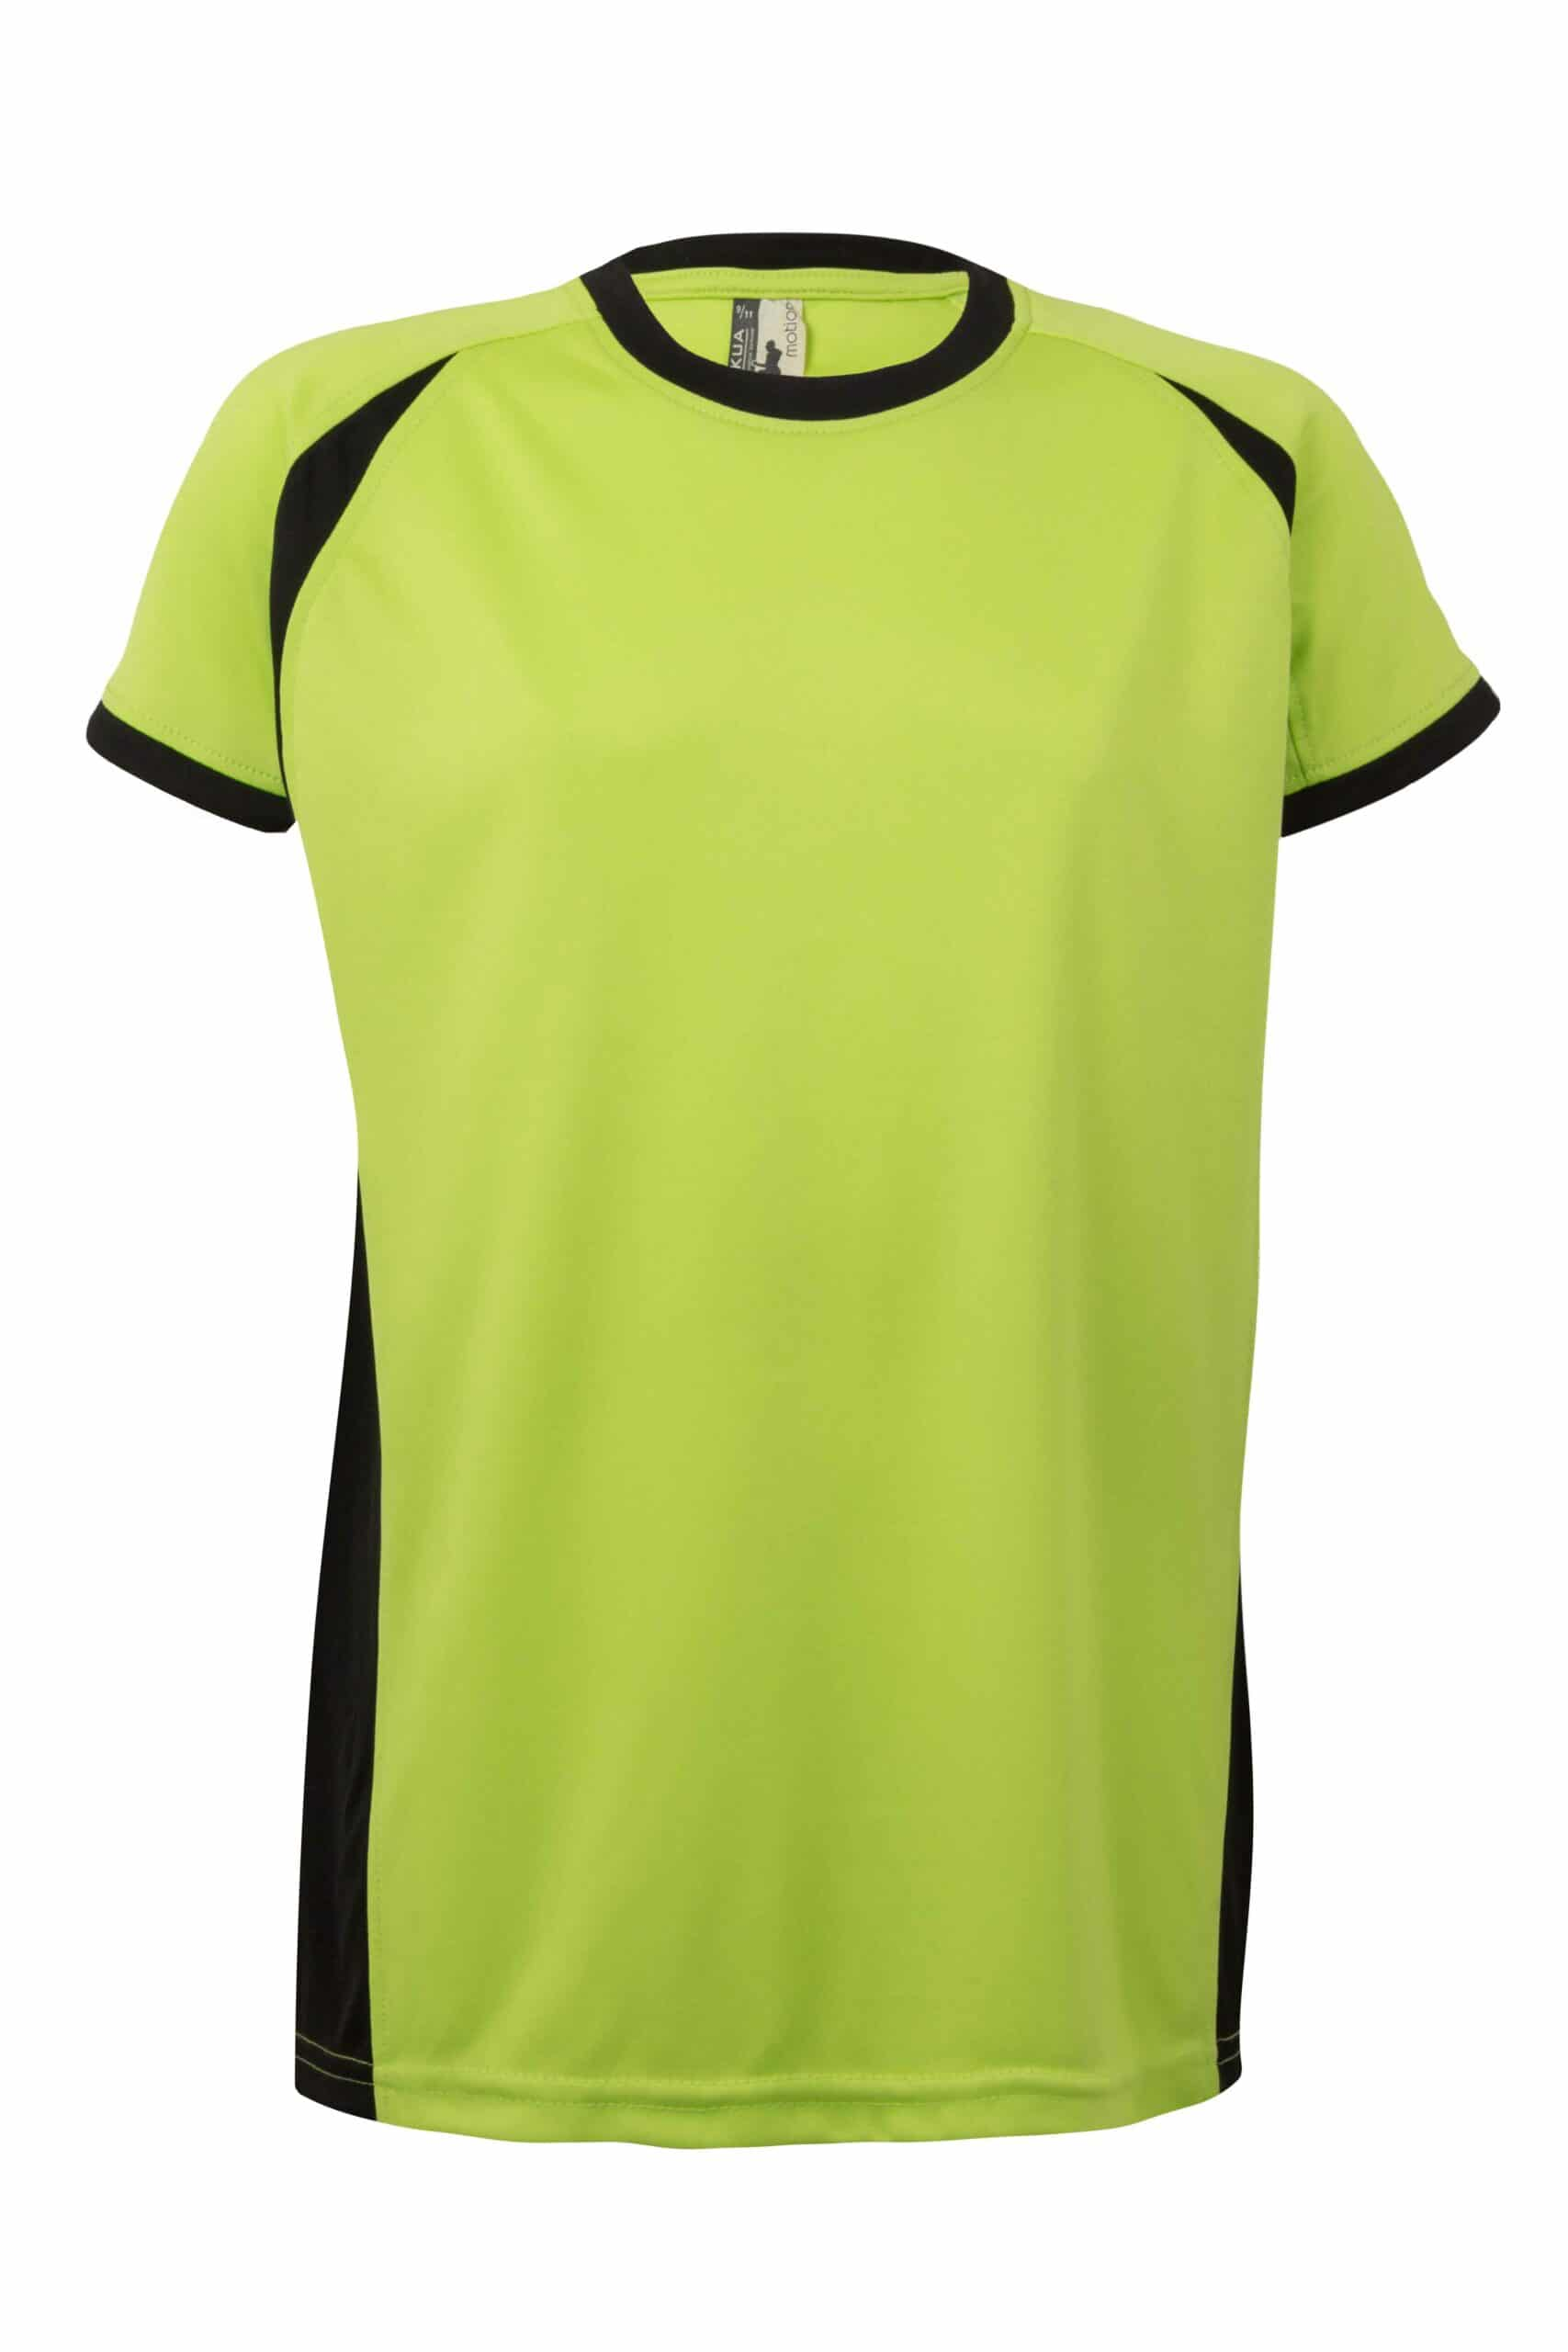 Mukua Mk531v Camiseta TÉcnica Manga Corta Bicolor NiÑo Lime Black 1